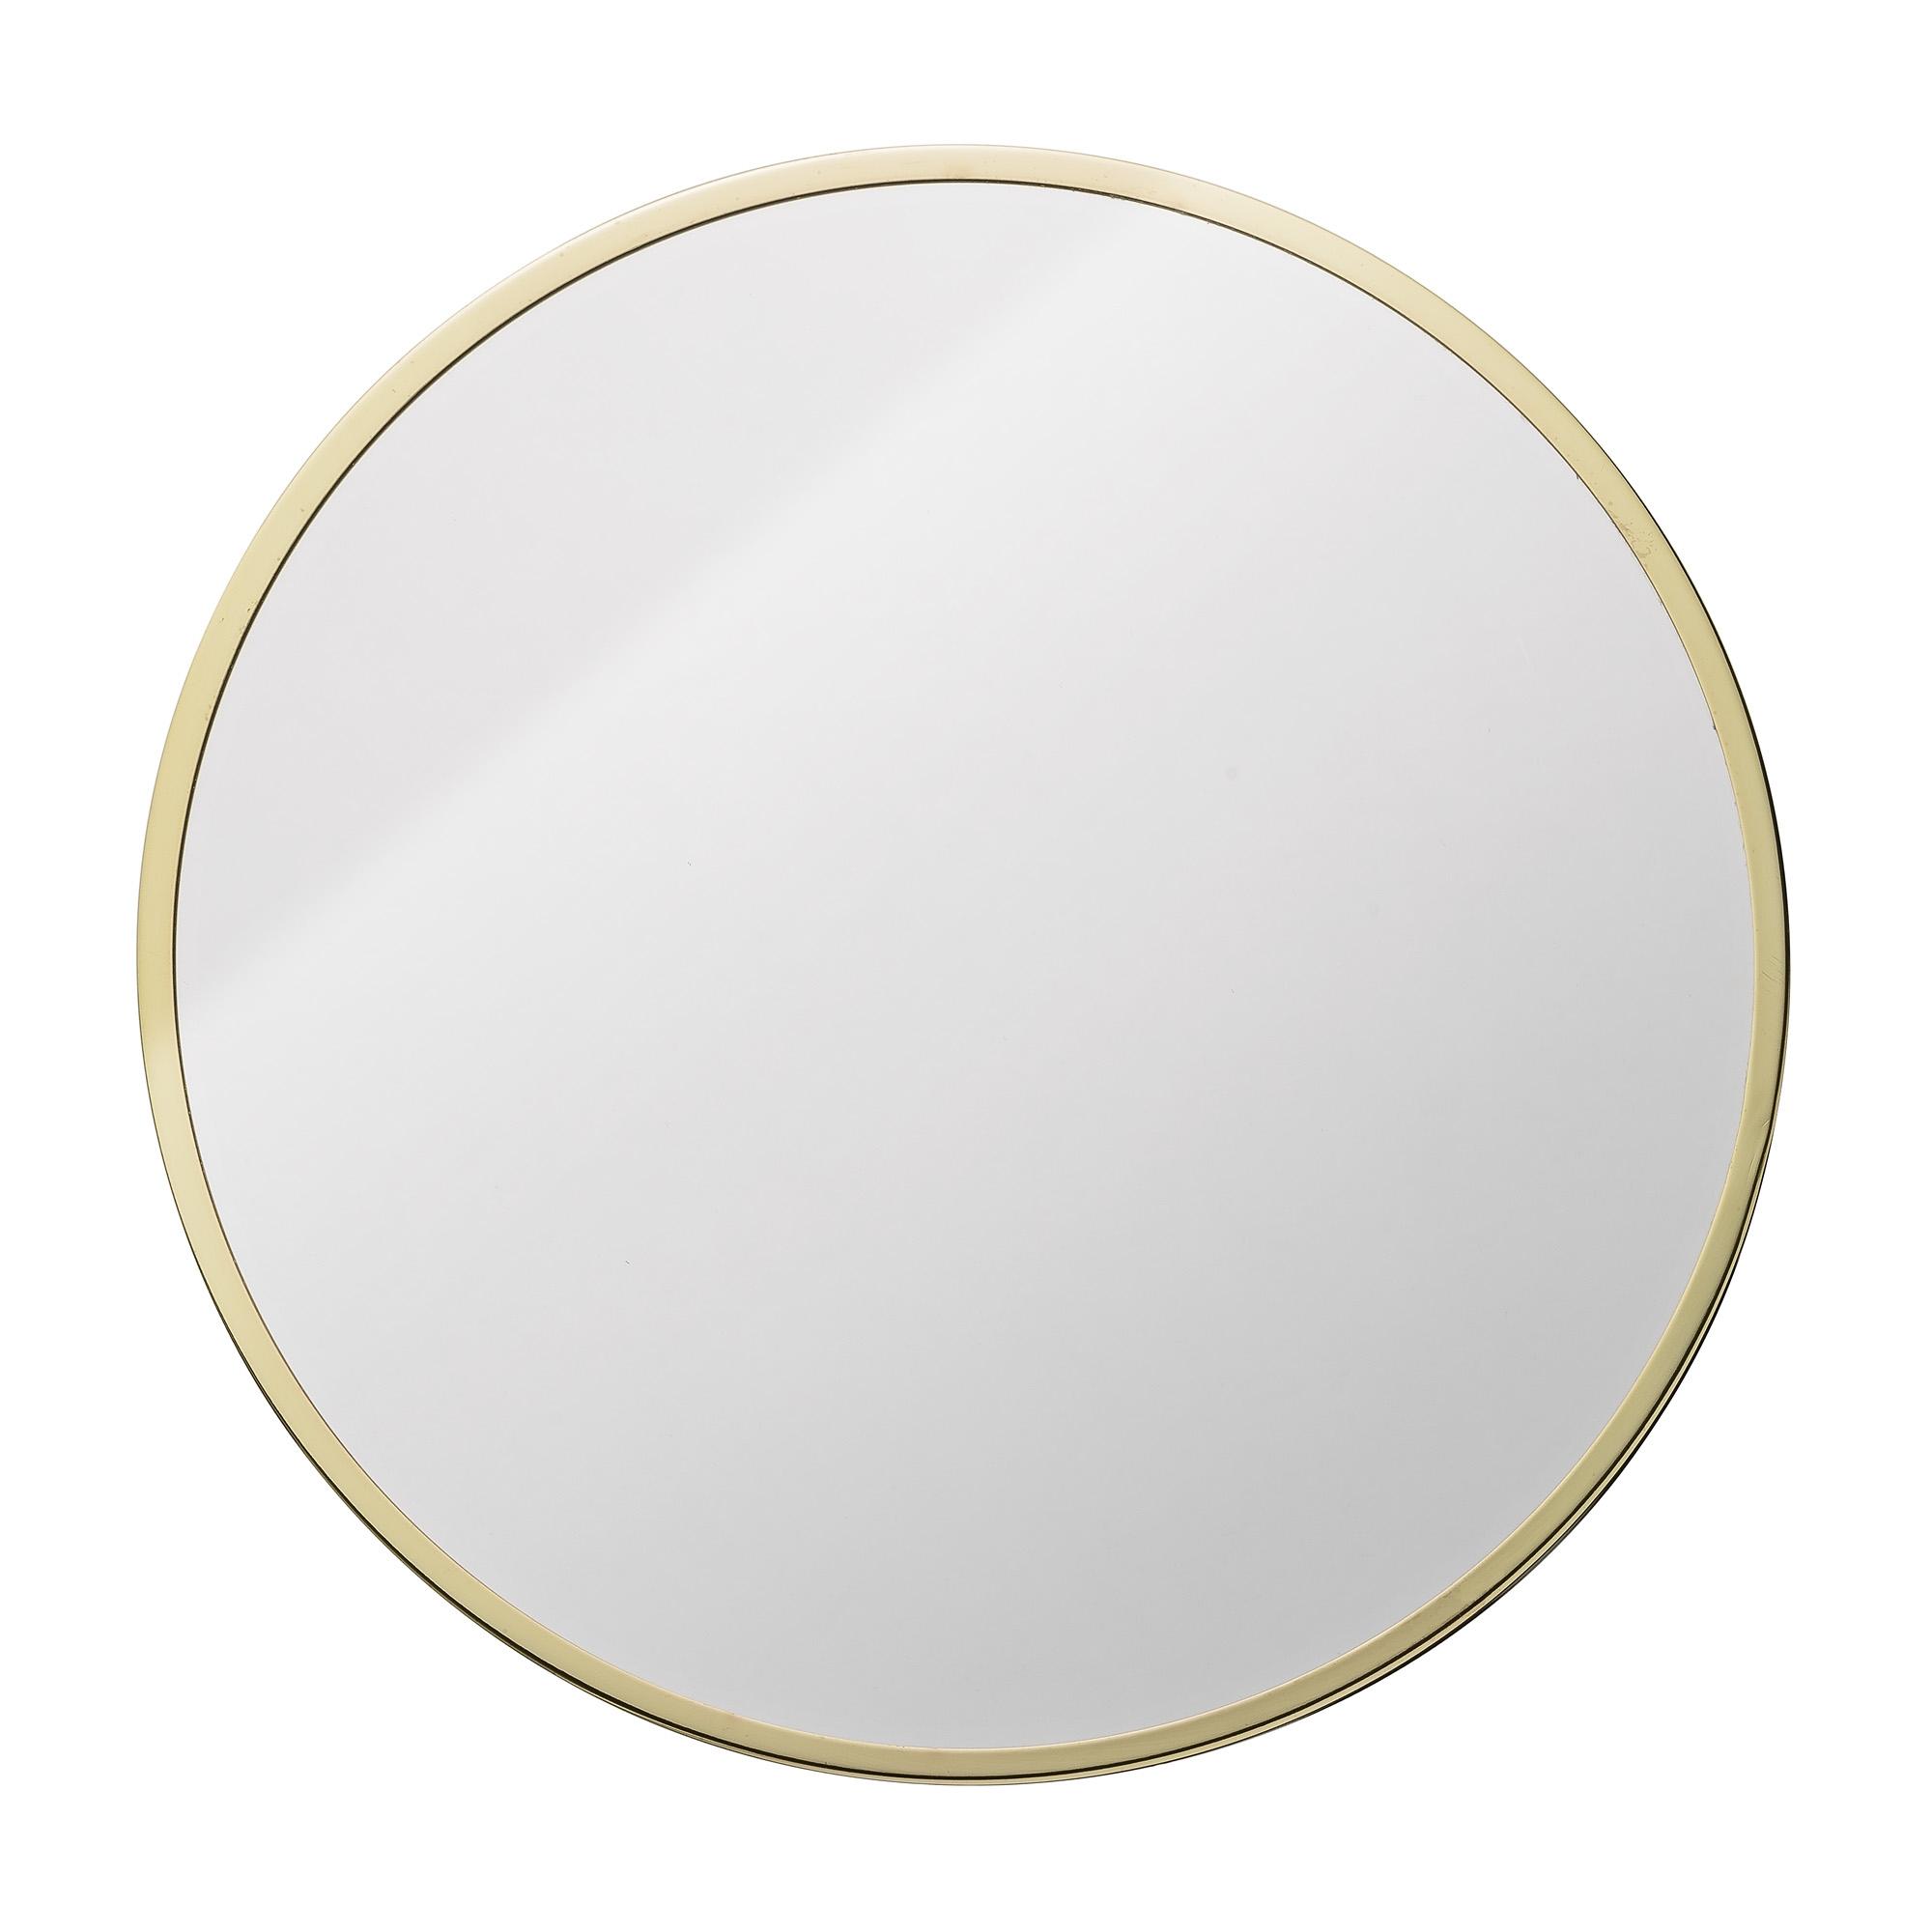 Oglinda decorativa din metal Goldy Auriu, Ø38 cm imagine